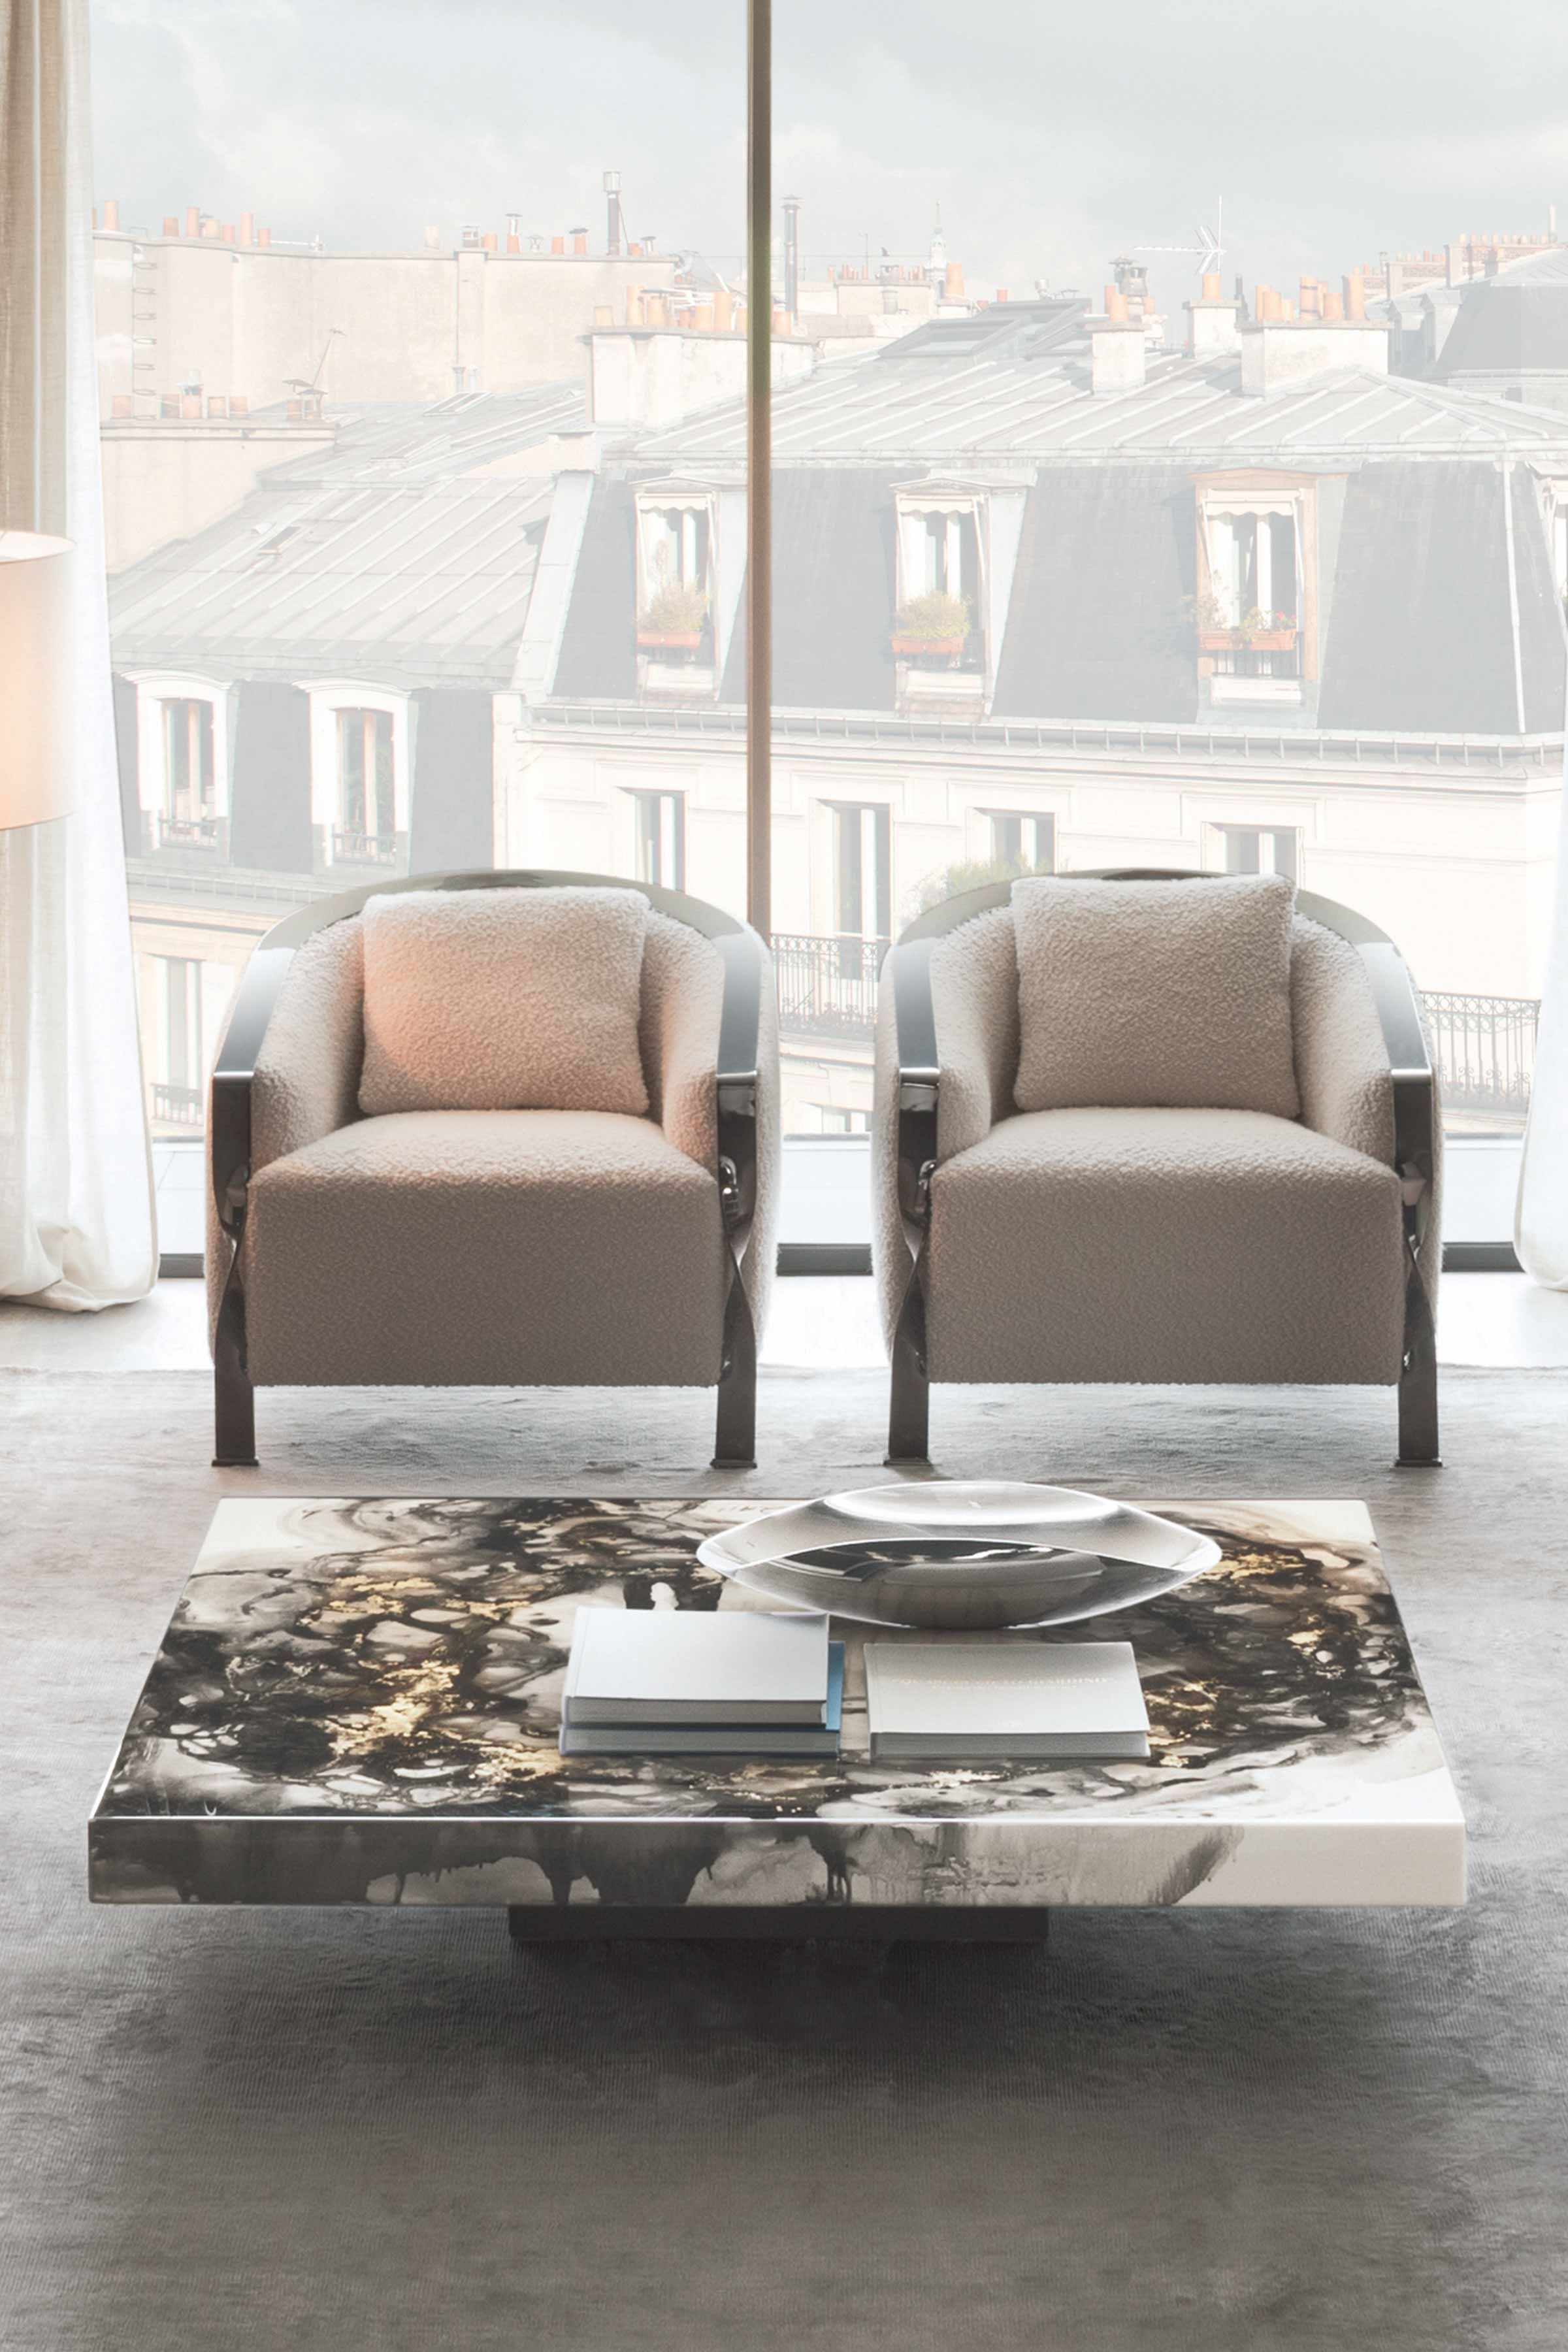 Rugiano Coffee Table Furniture Furniture Side Tables Elegant Furniture [ 3600 x 2400 Pixel ]